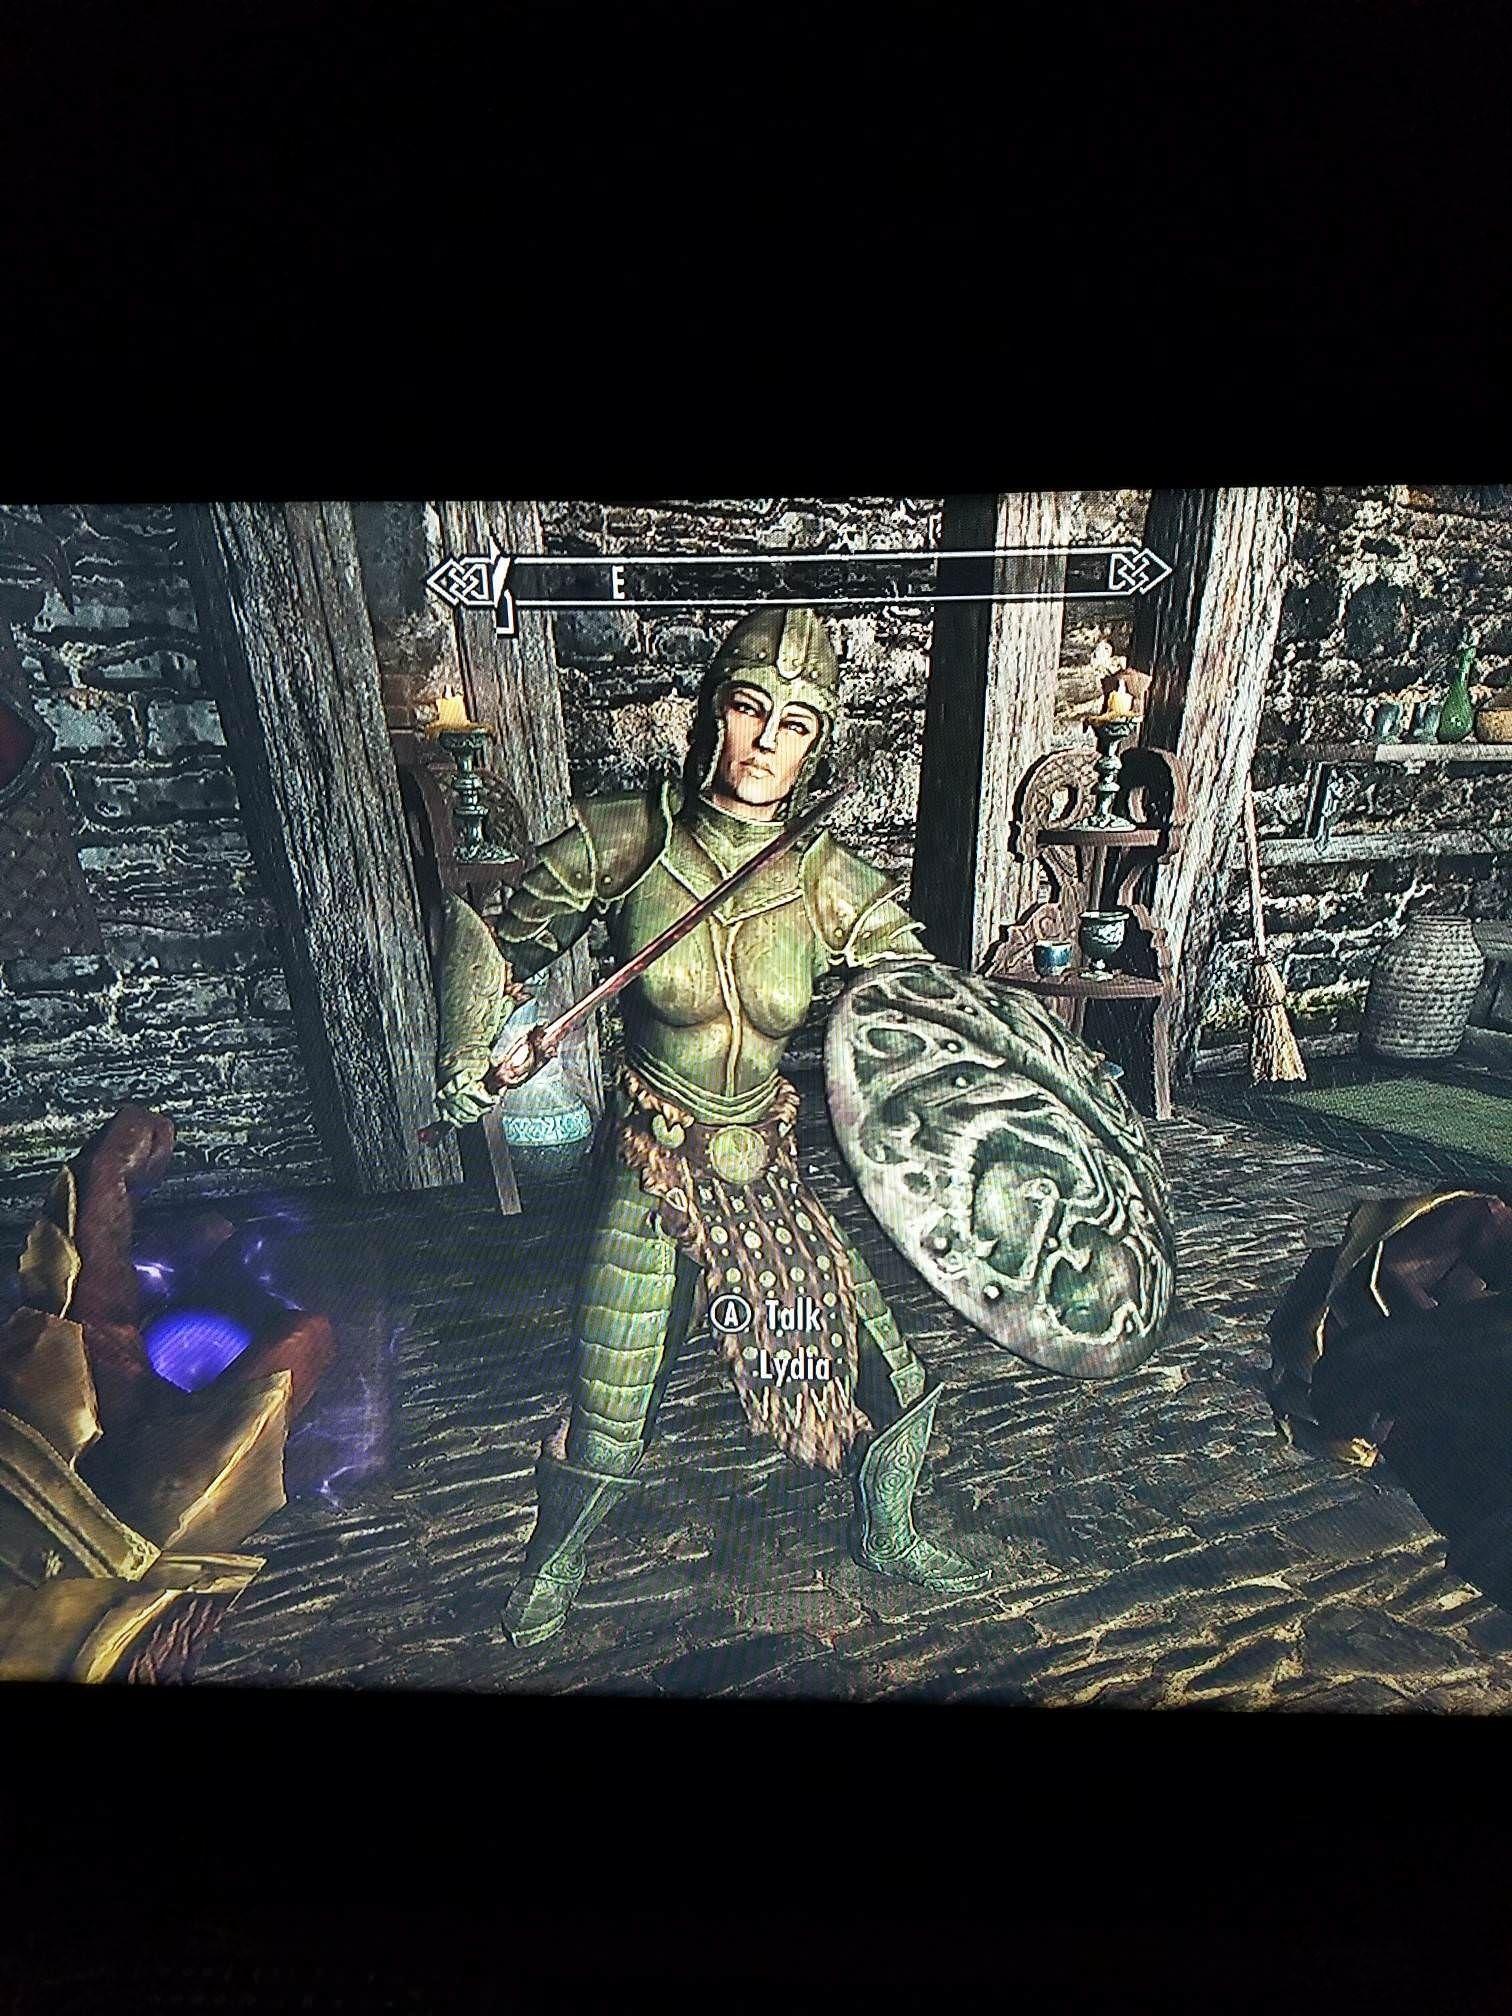 Lydia the Warrior #games #Skyrim #elderscrolls #BE3 # ...